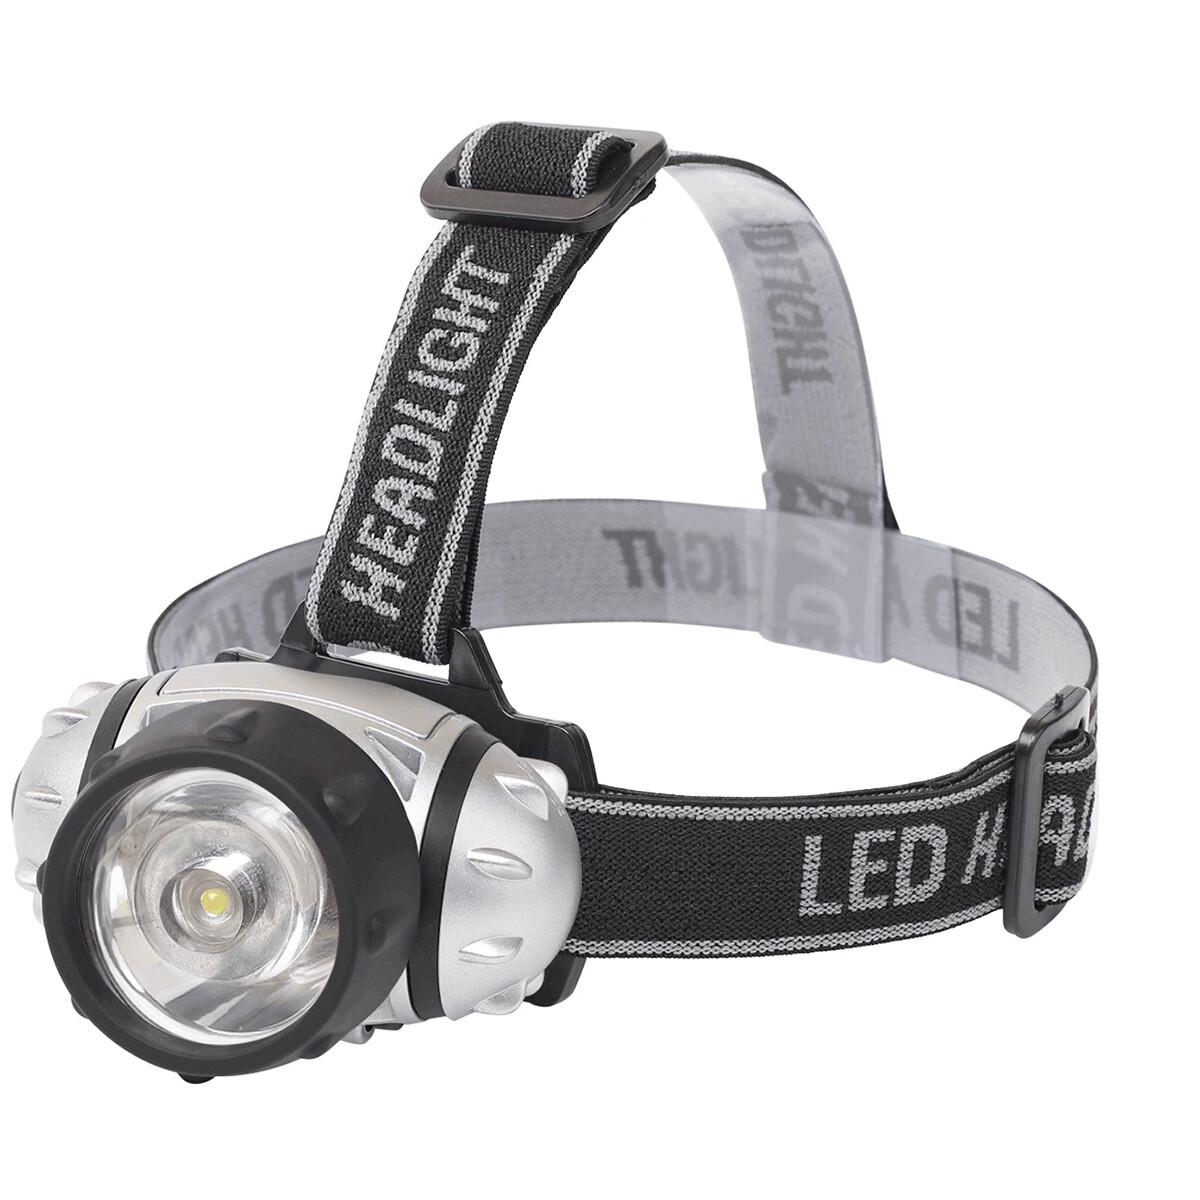 LED Hoofdlamp - Aigi Hitro - Waterdicht - 50 Meter - Kantelbaar - 1 LED - 1.8W - Zilver | Vervangt 1